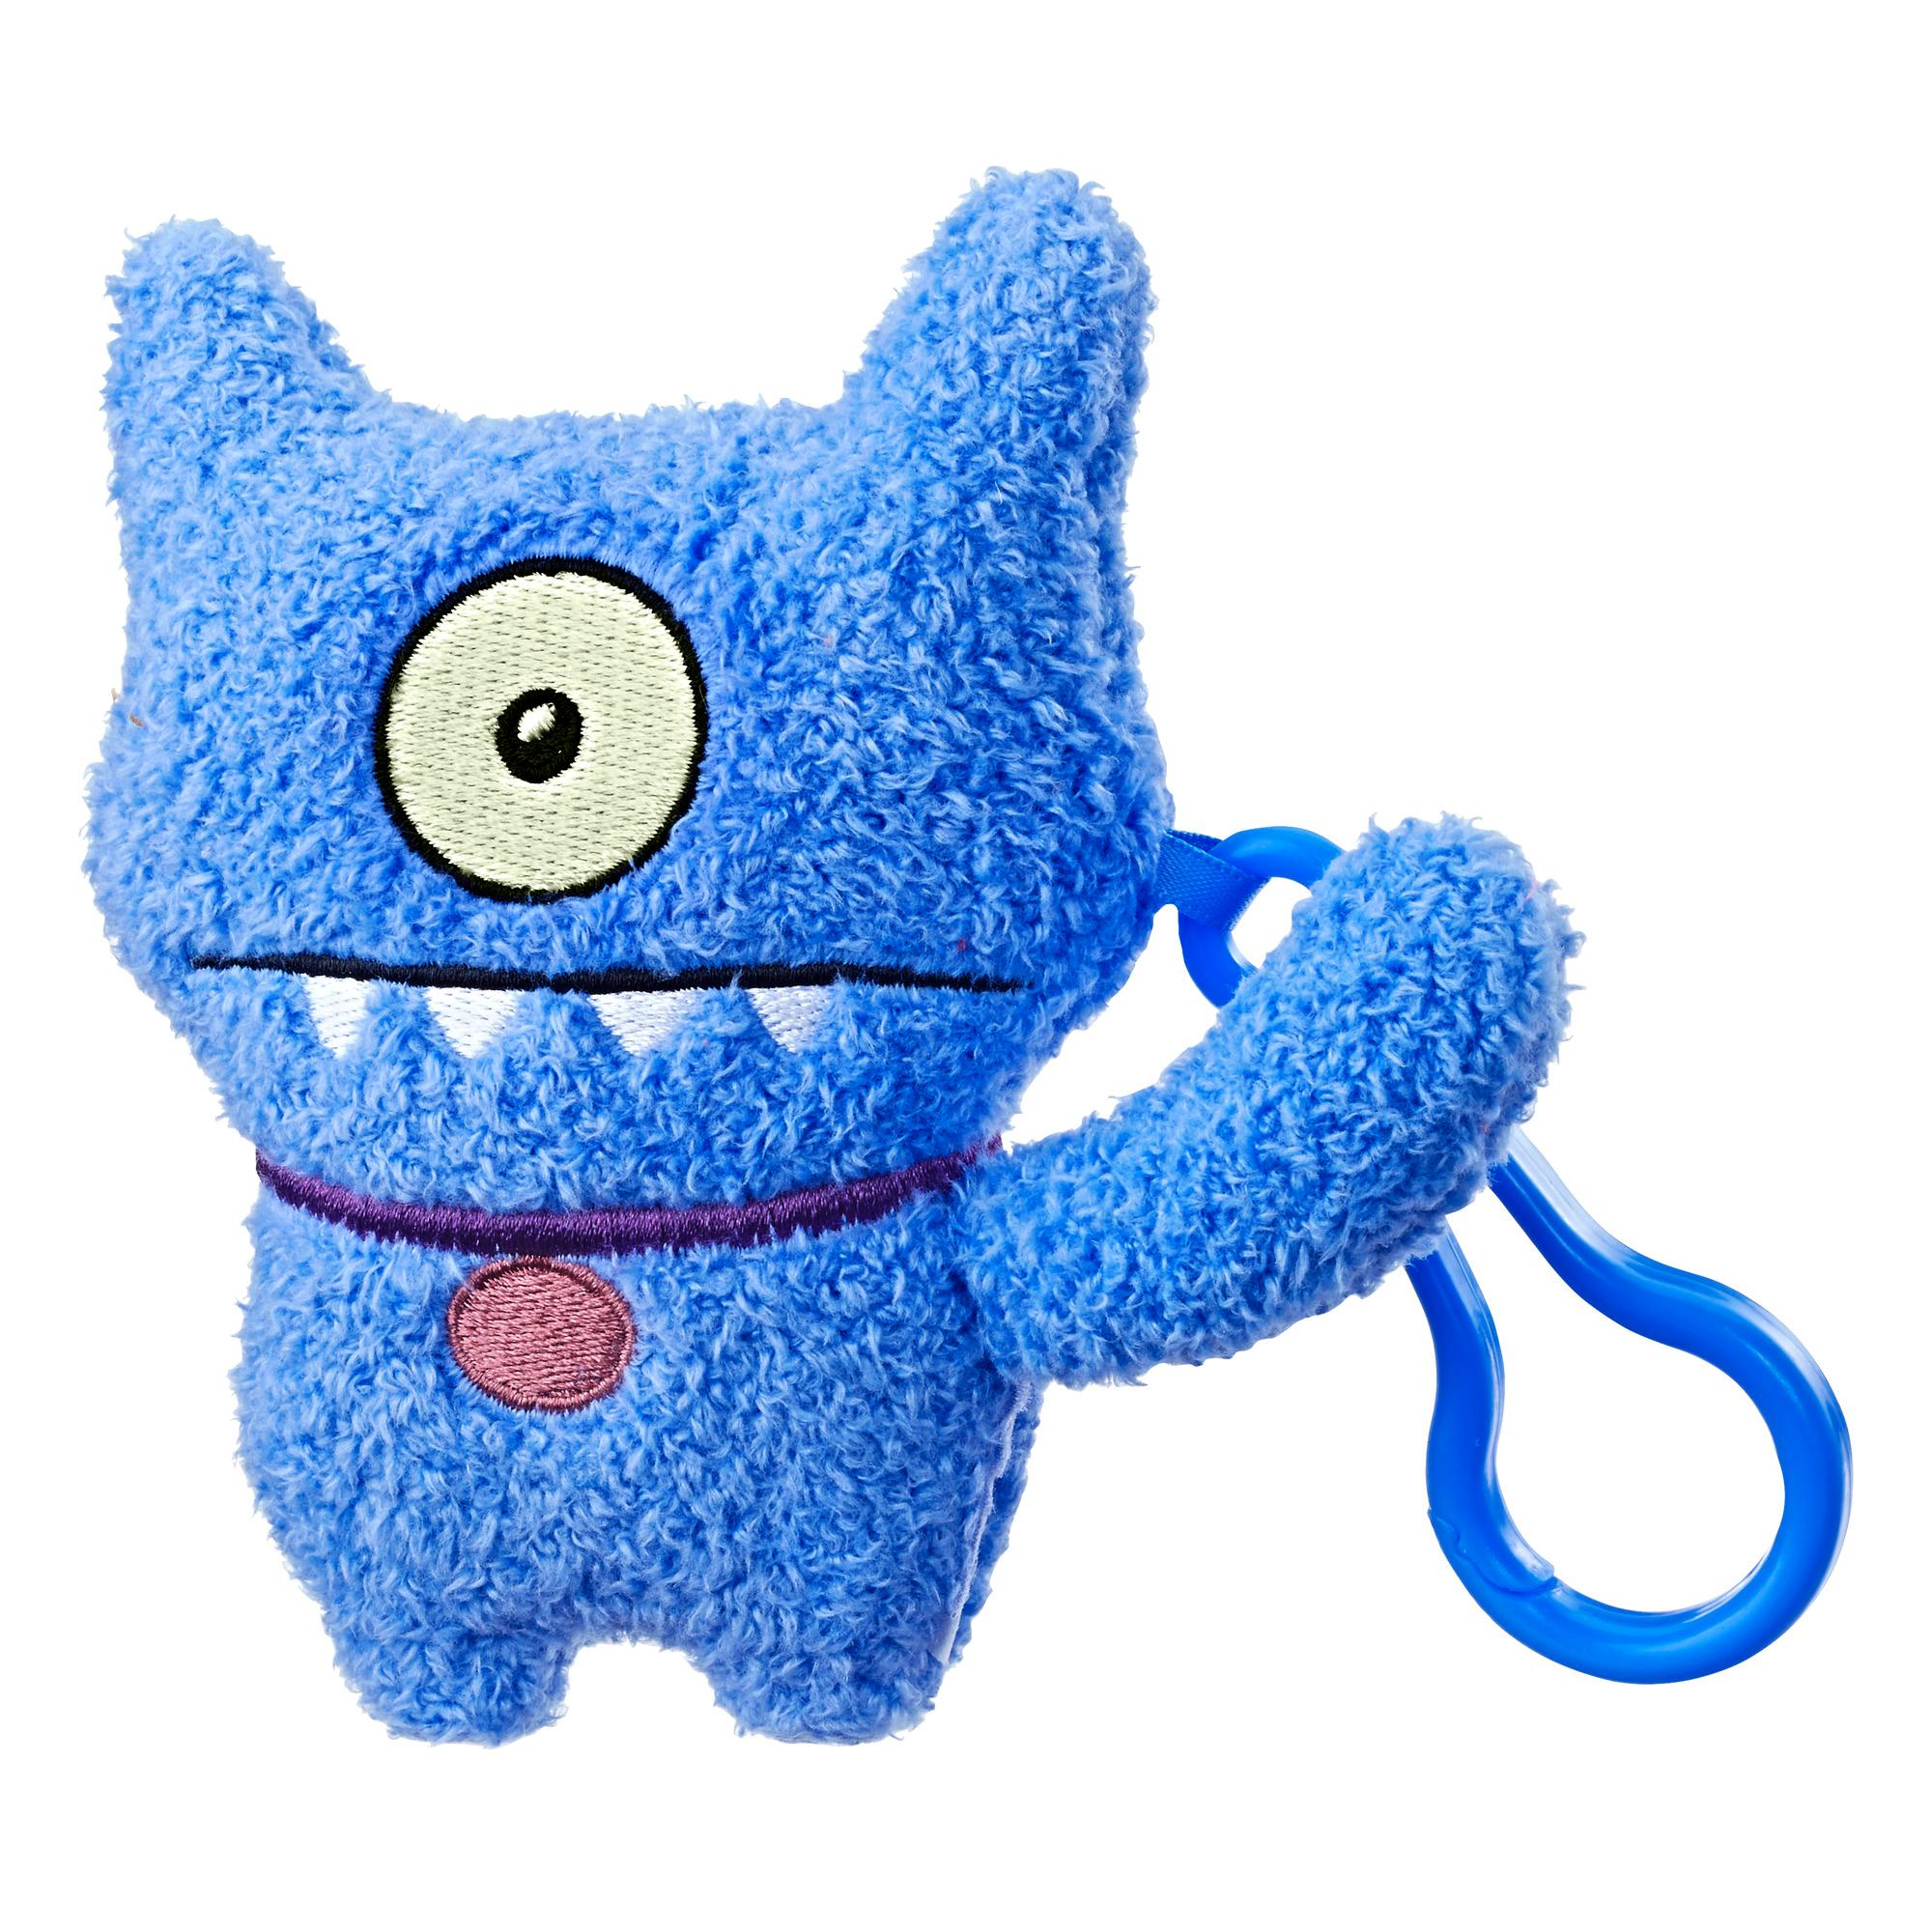 UglyDolls Ugly Dog To-Go Stuffed Plush Toy, 5 inches tall